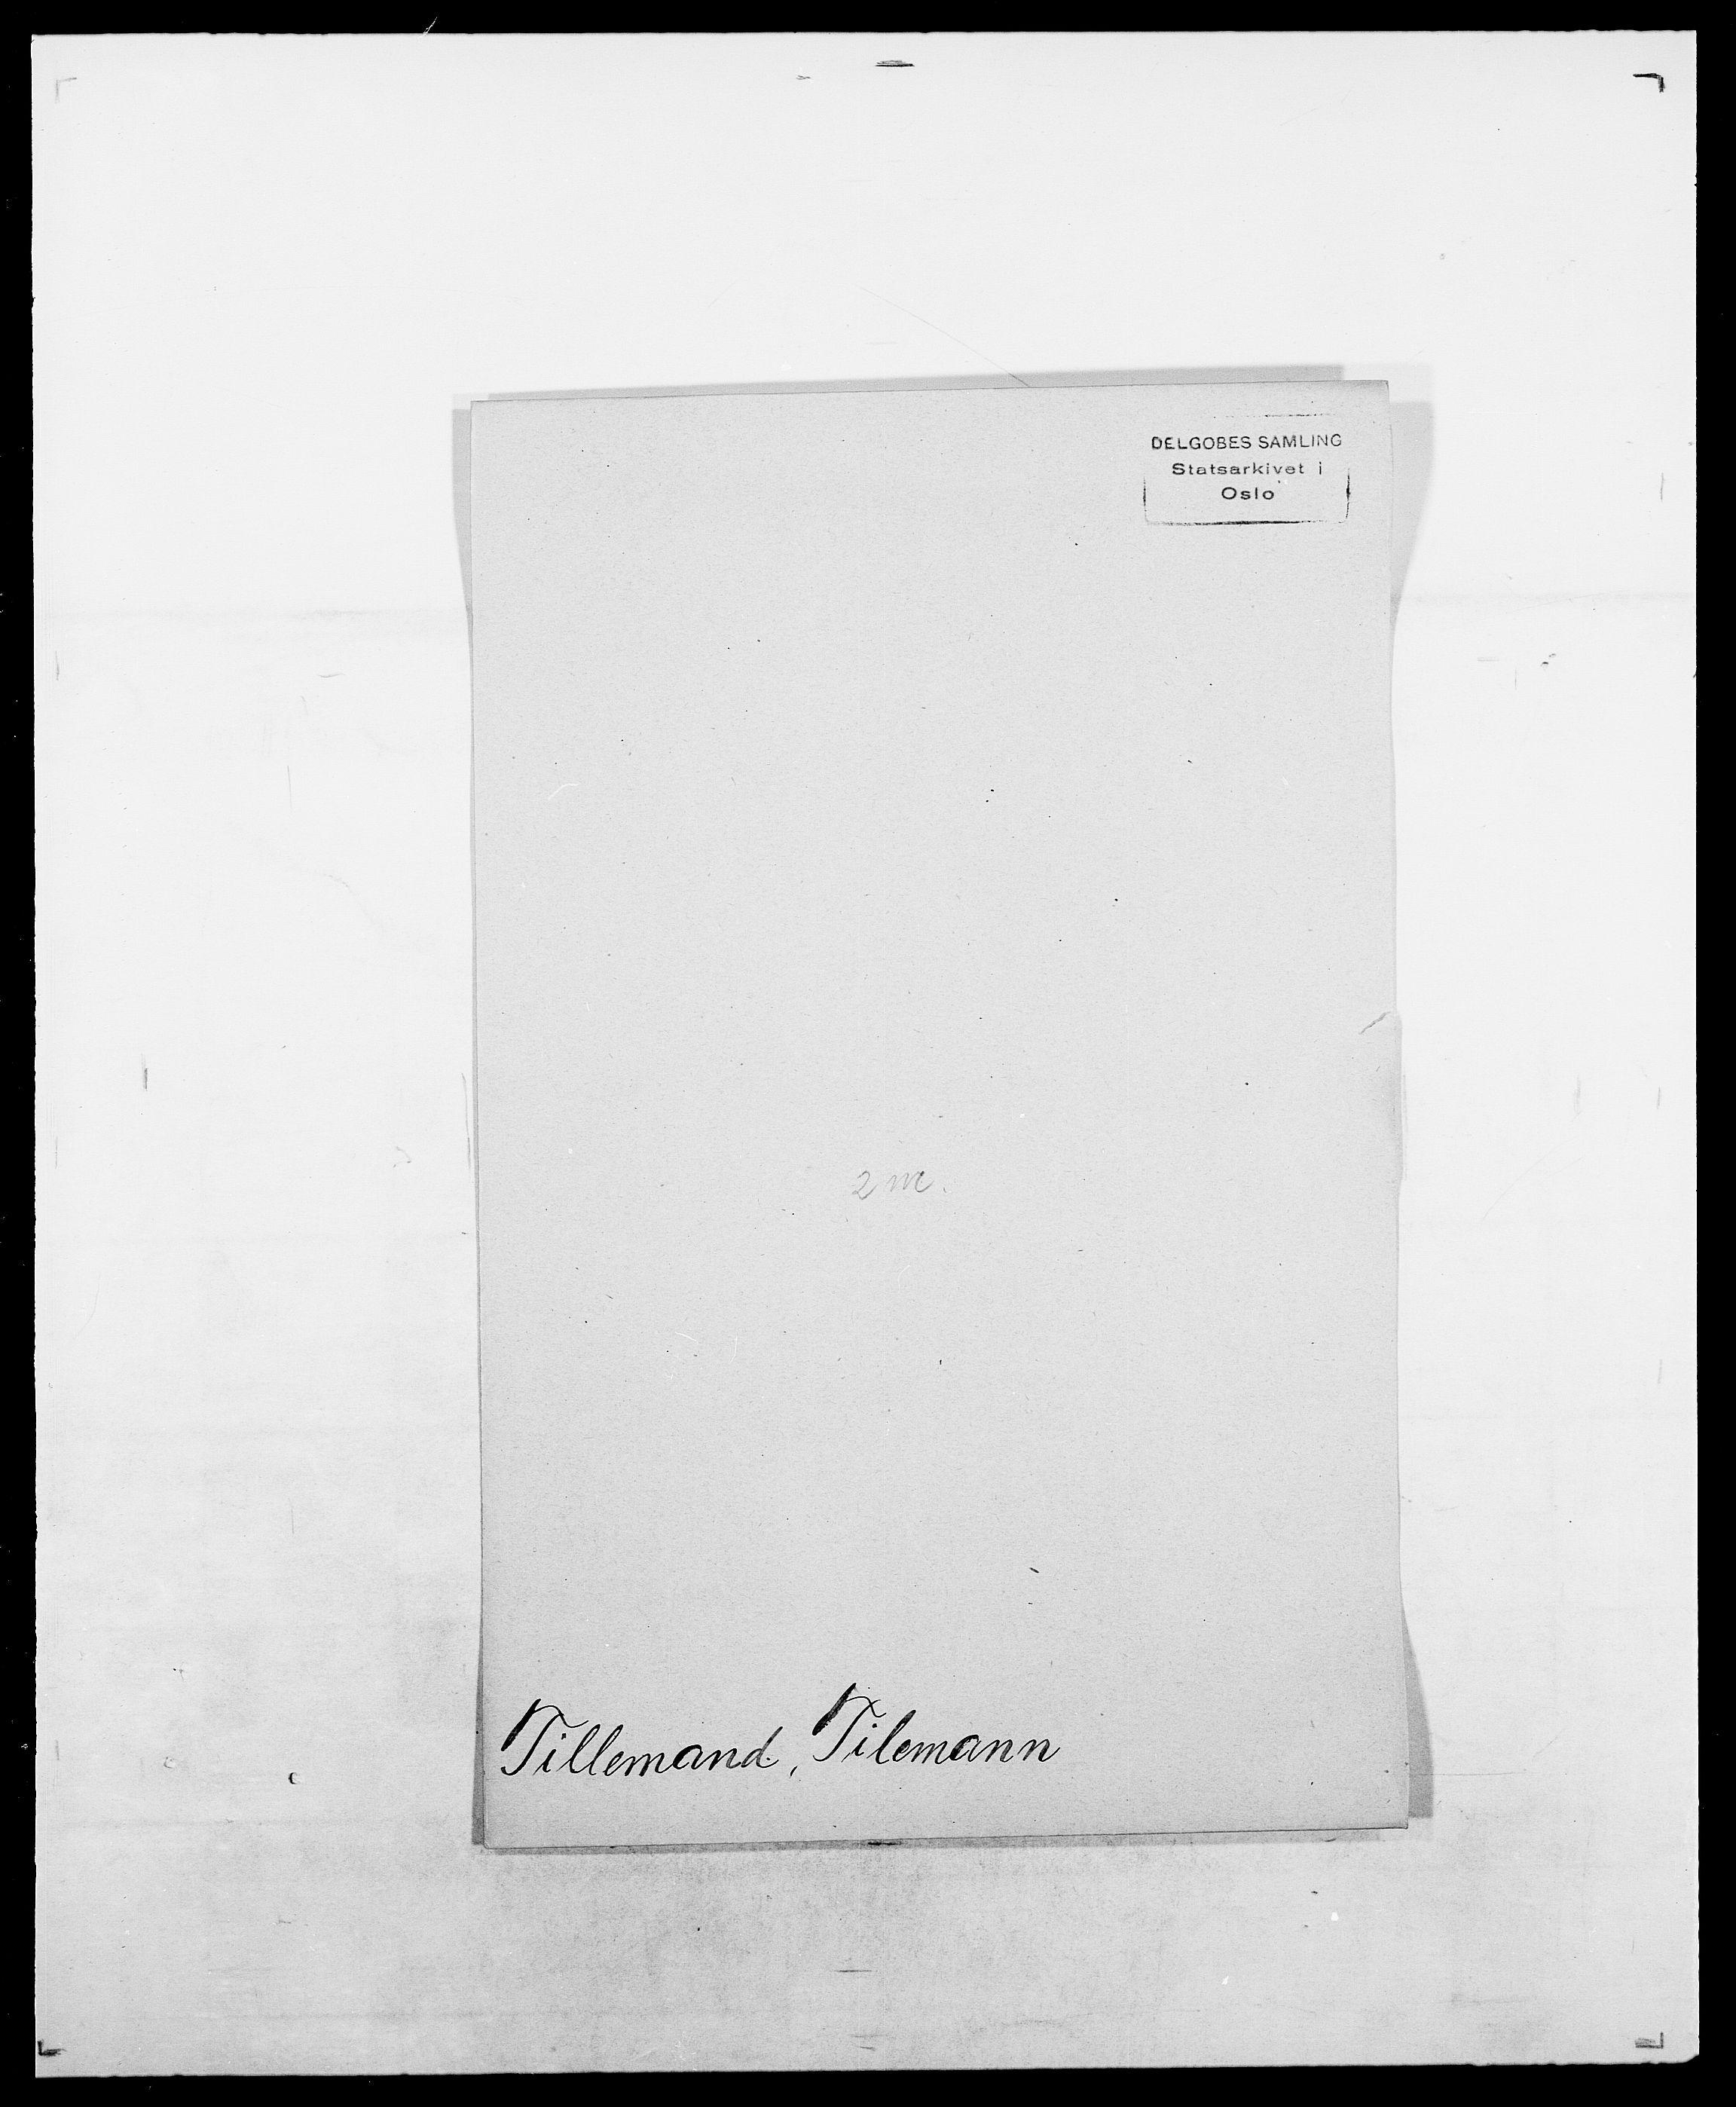 SAO, Delgobe, Charles Antoine - samling, D/Da/L0039: Thorsen - Urup, s. 31